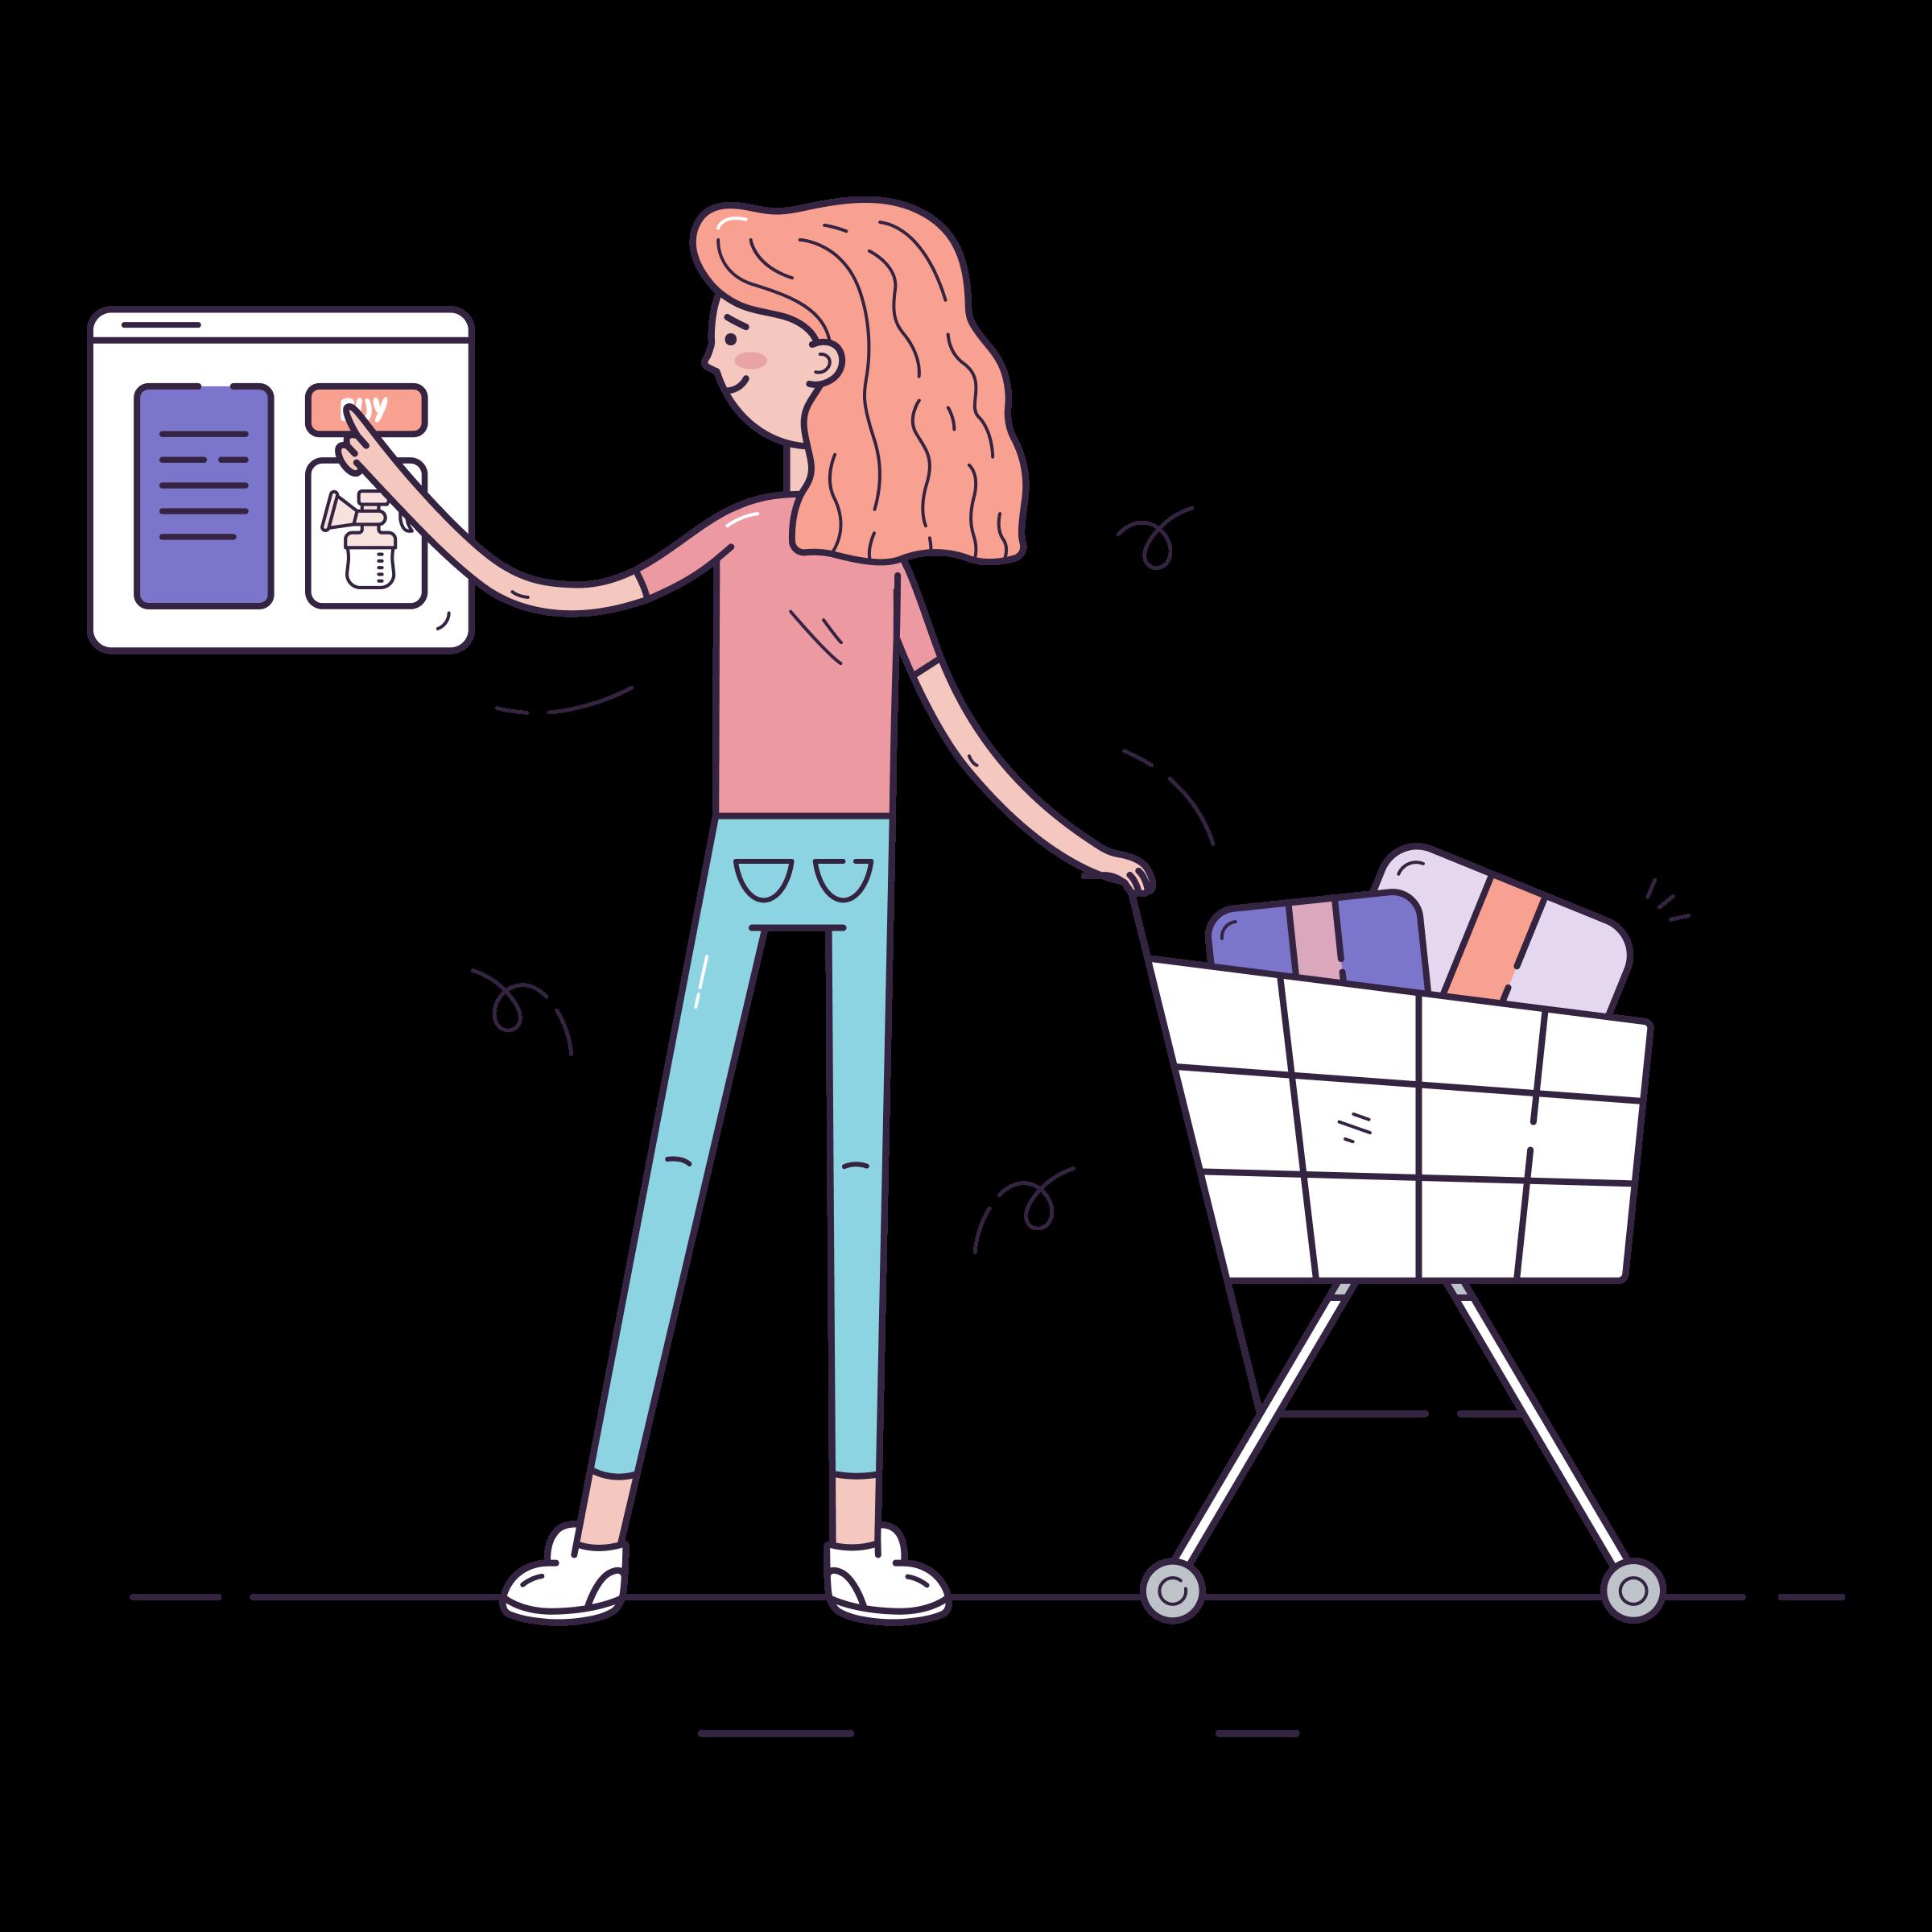 Vector image - Woman buying online